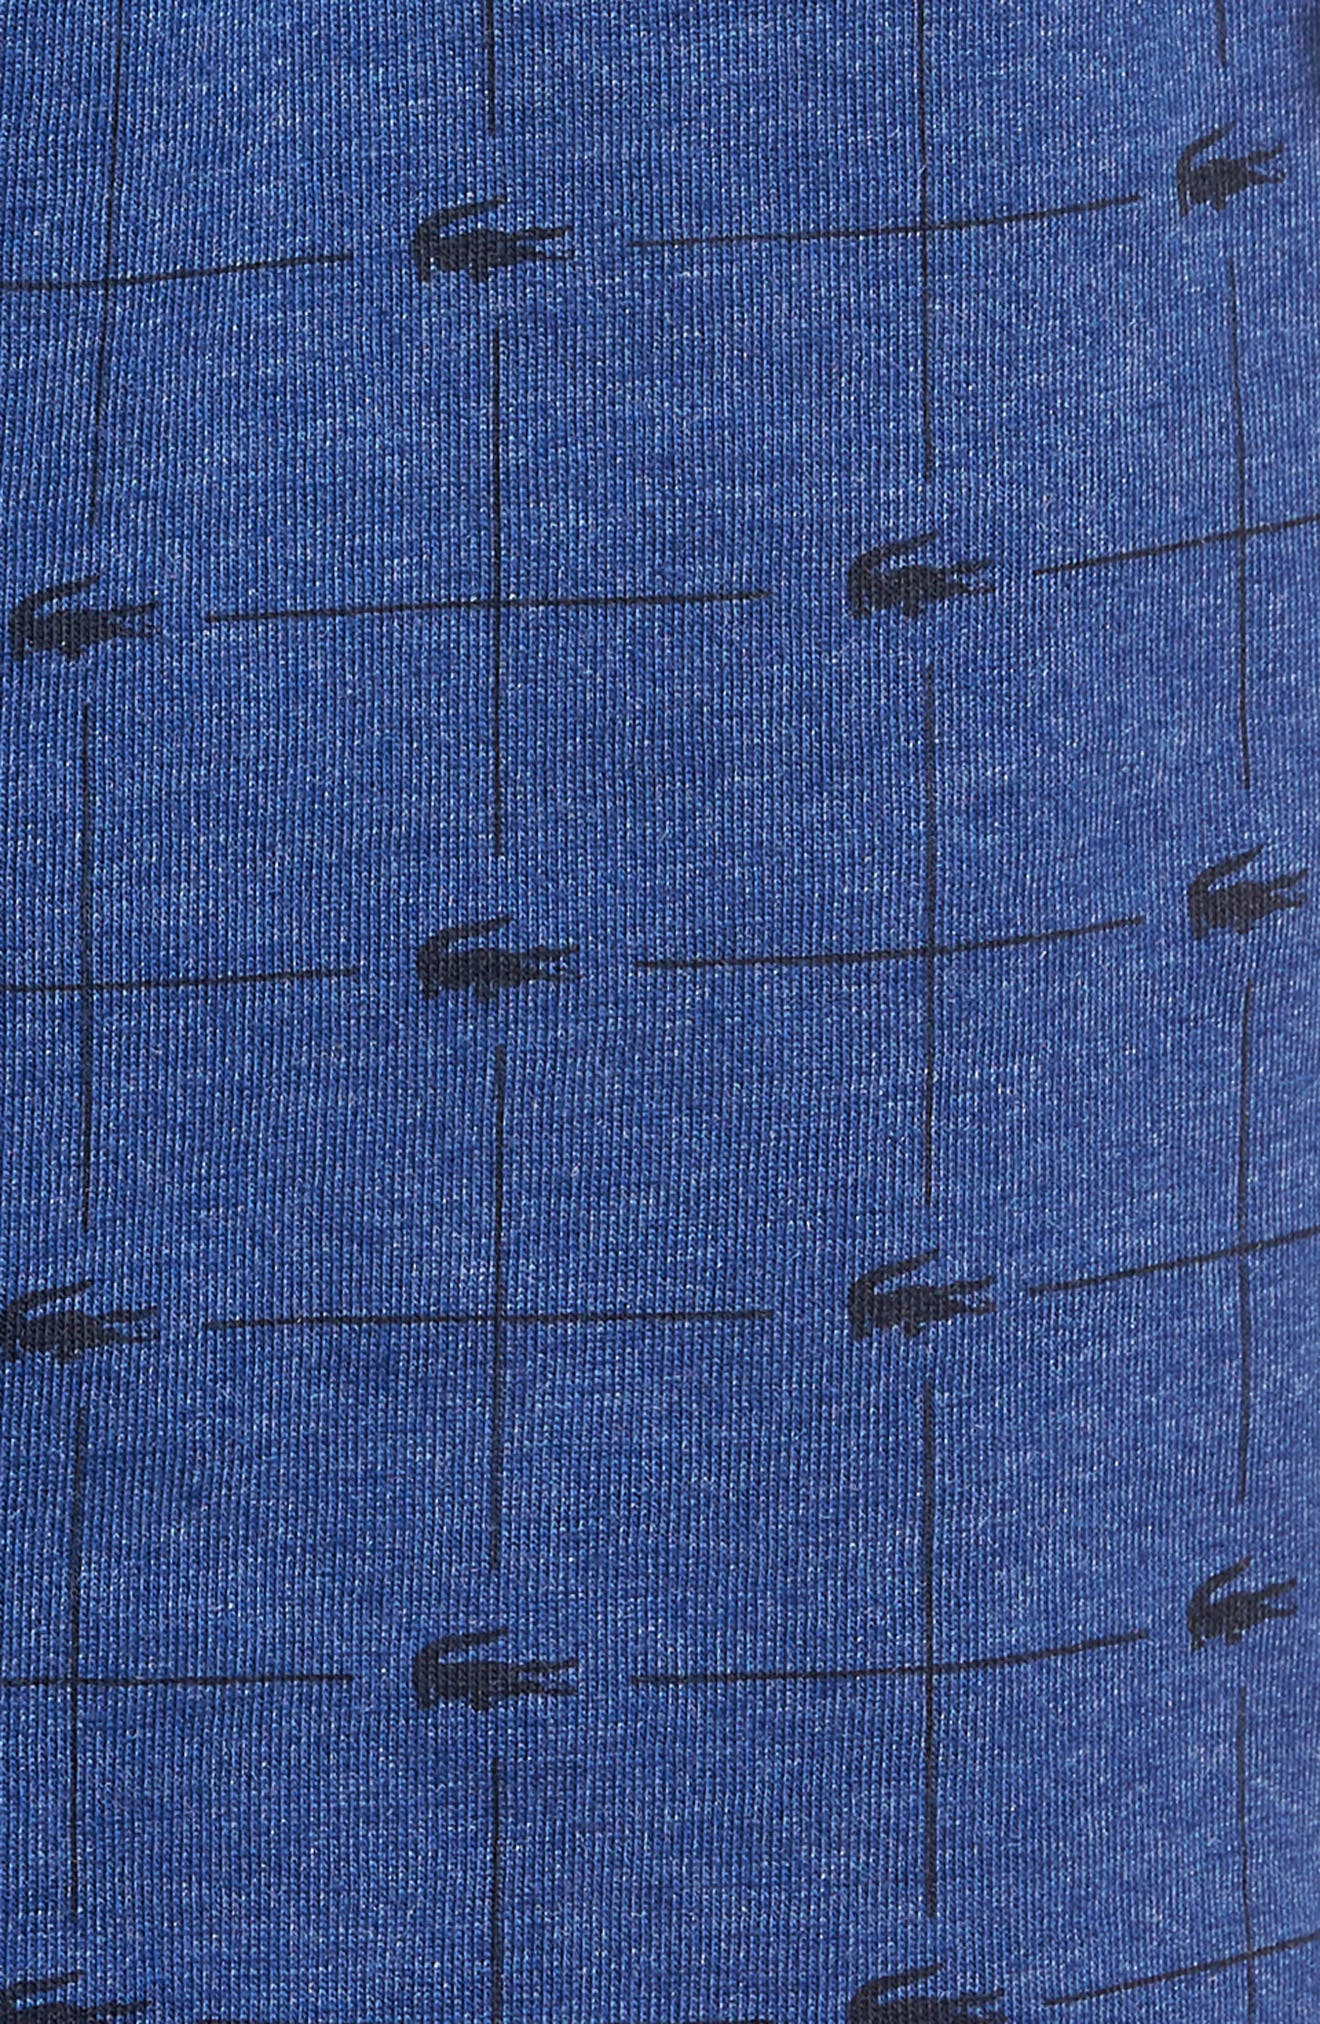 Knit Cotton Lounge Shorts,                             Alternate thumbnail 4, color,                             Classic Blue